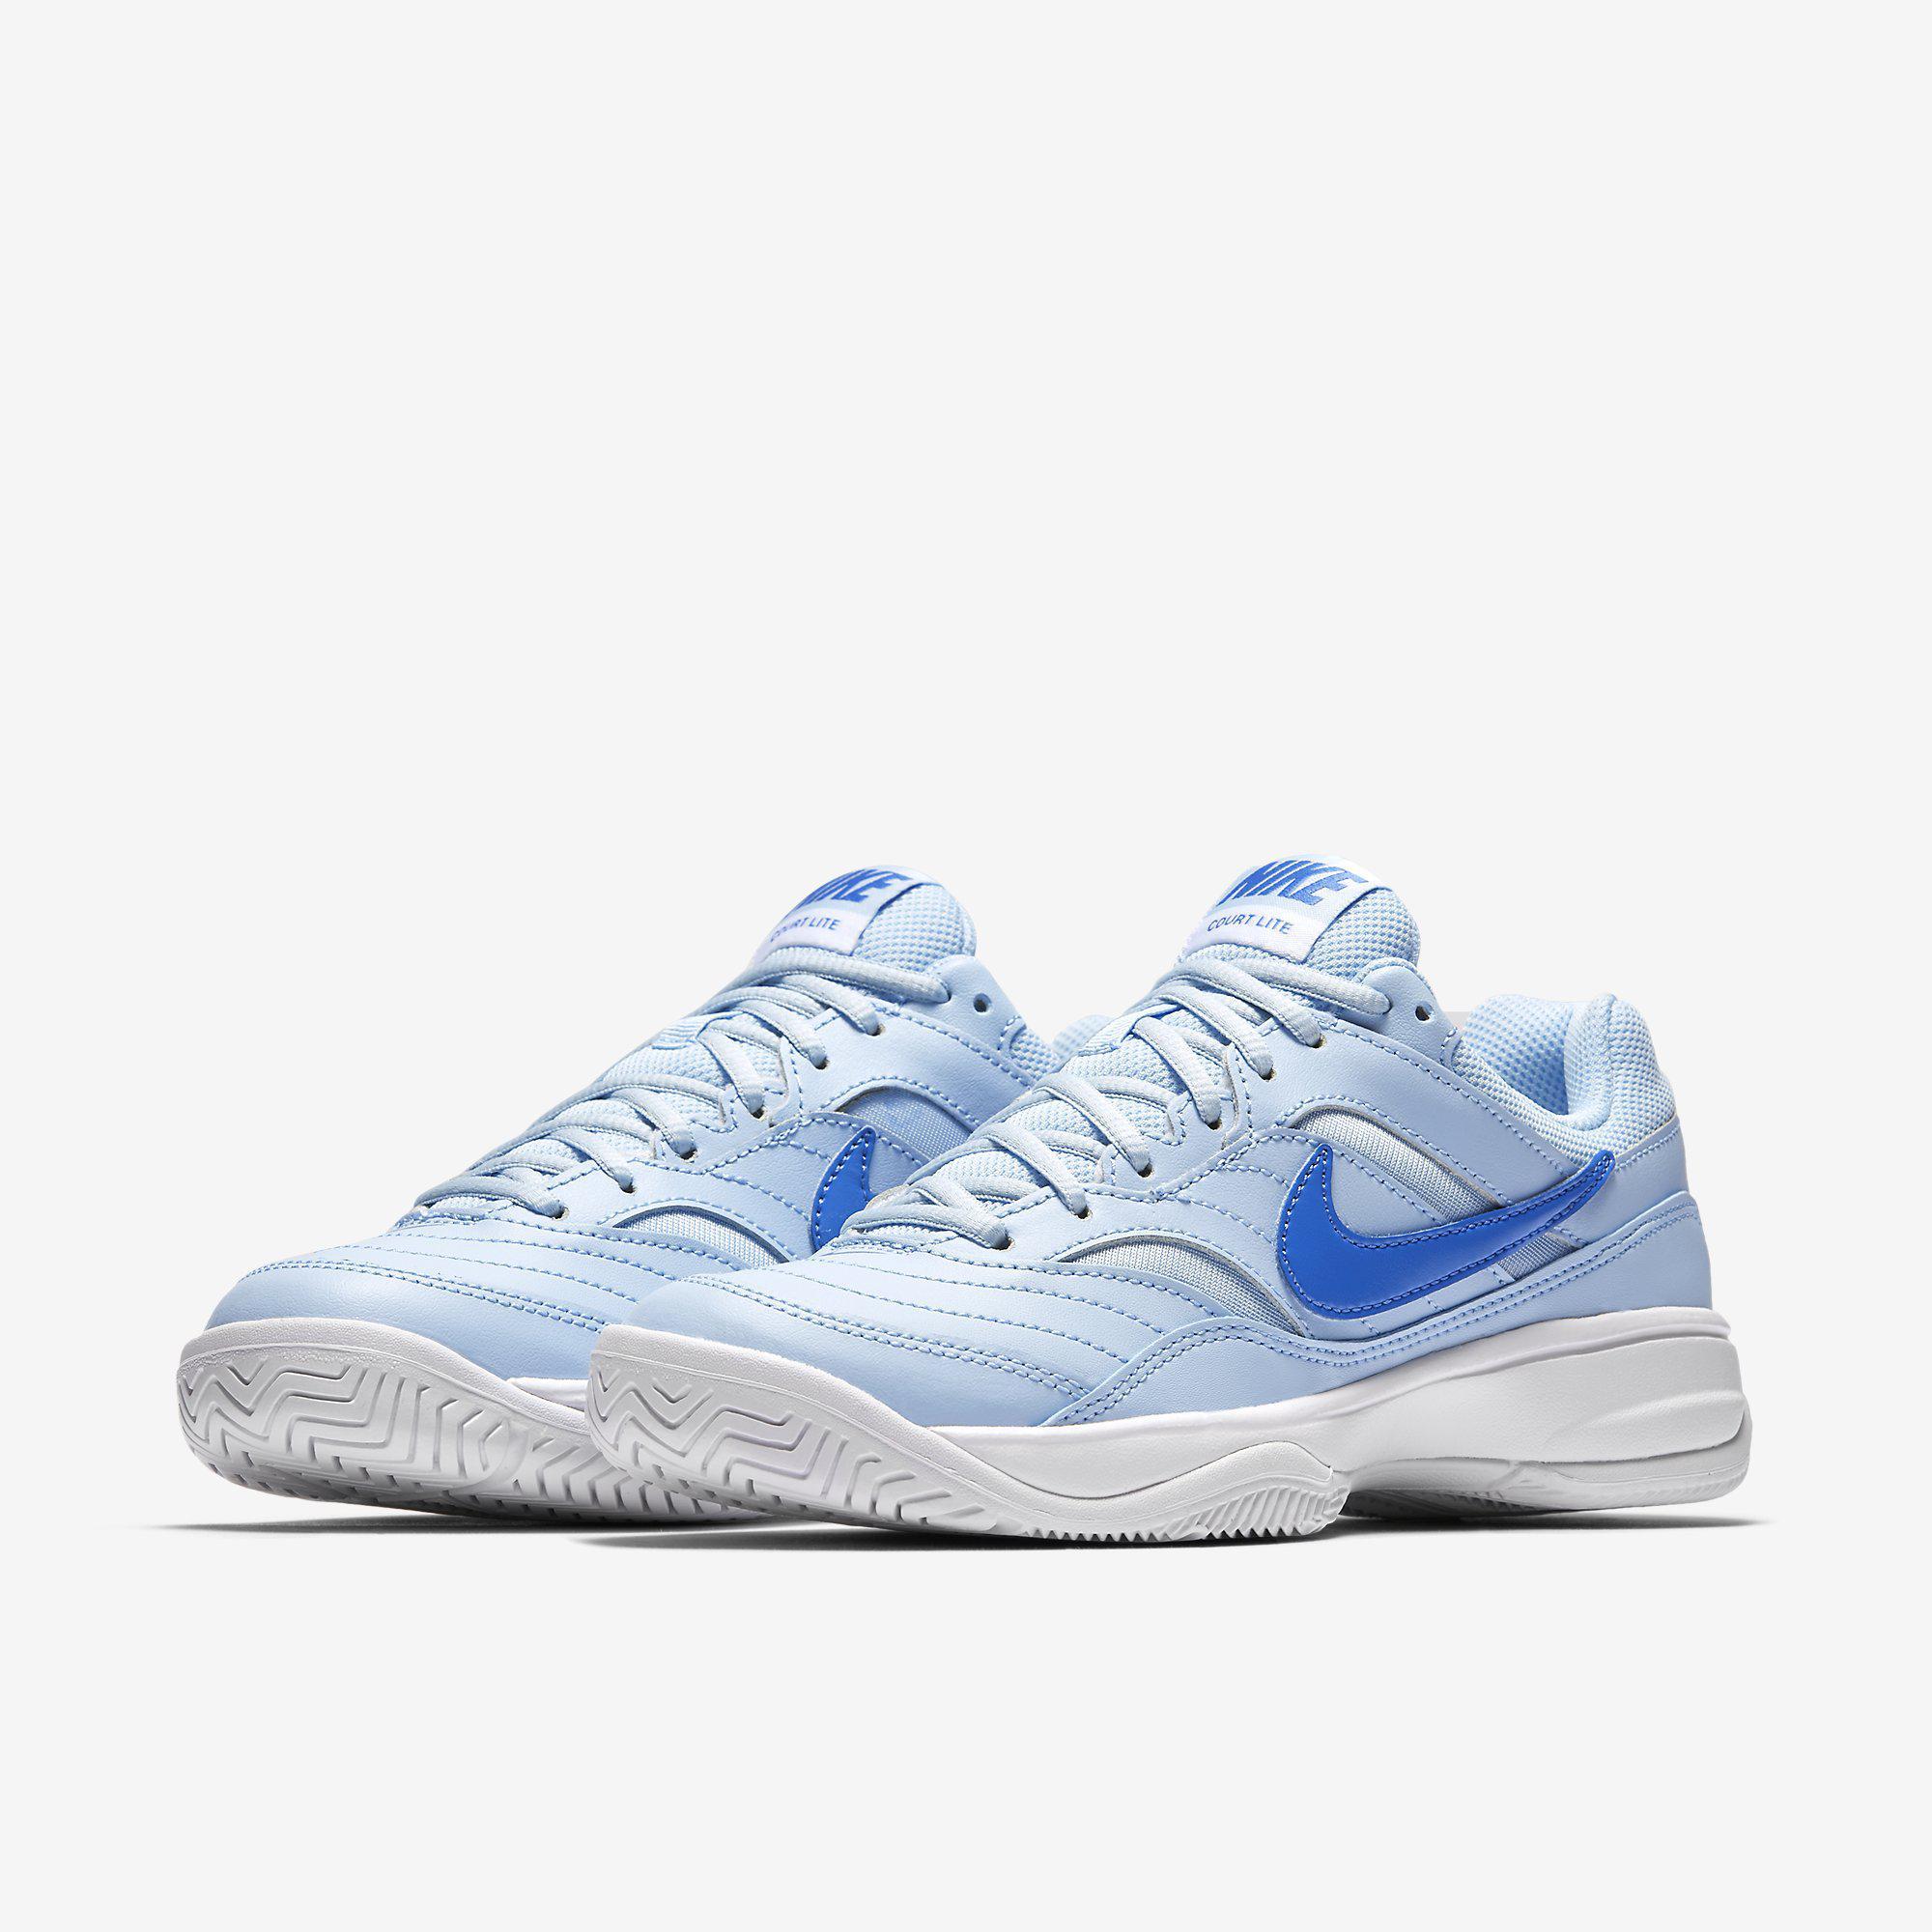 a0fe73a0de0d Nike Womens Court Lite Tennis Shoes - Ice Blue White - Tennisnuts.com